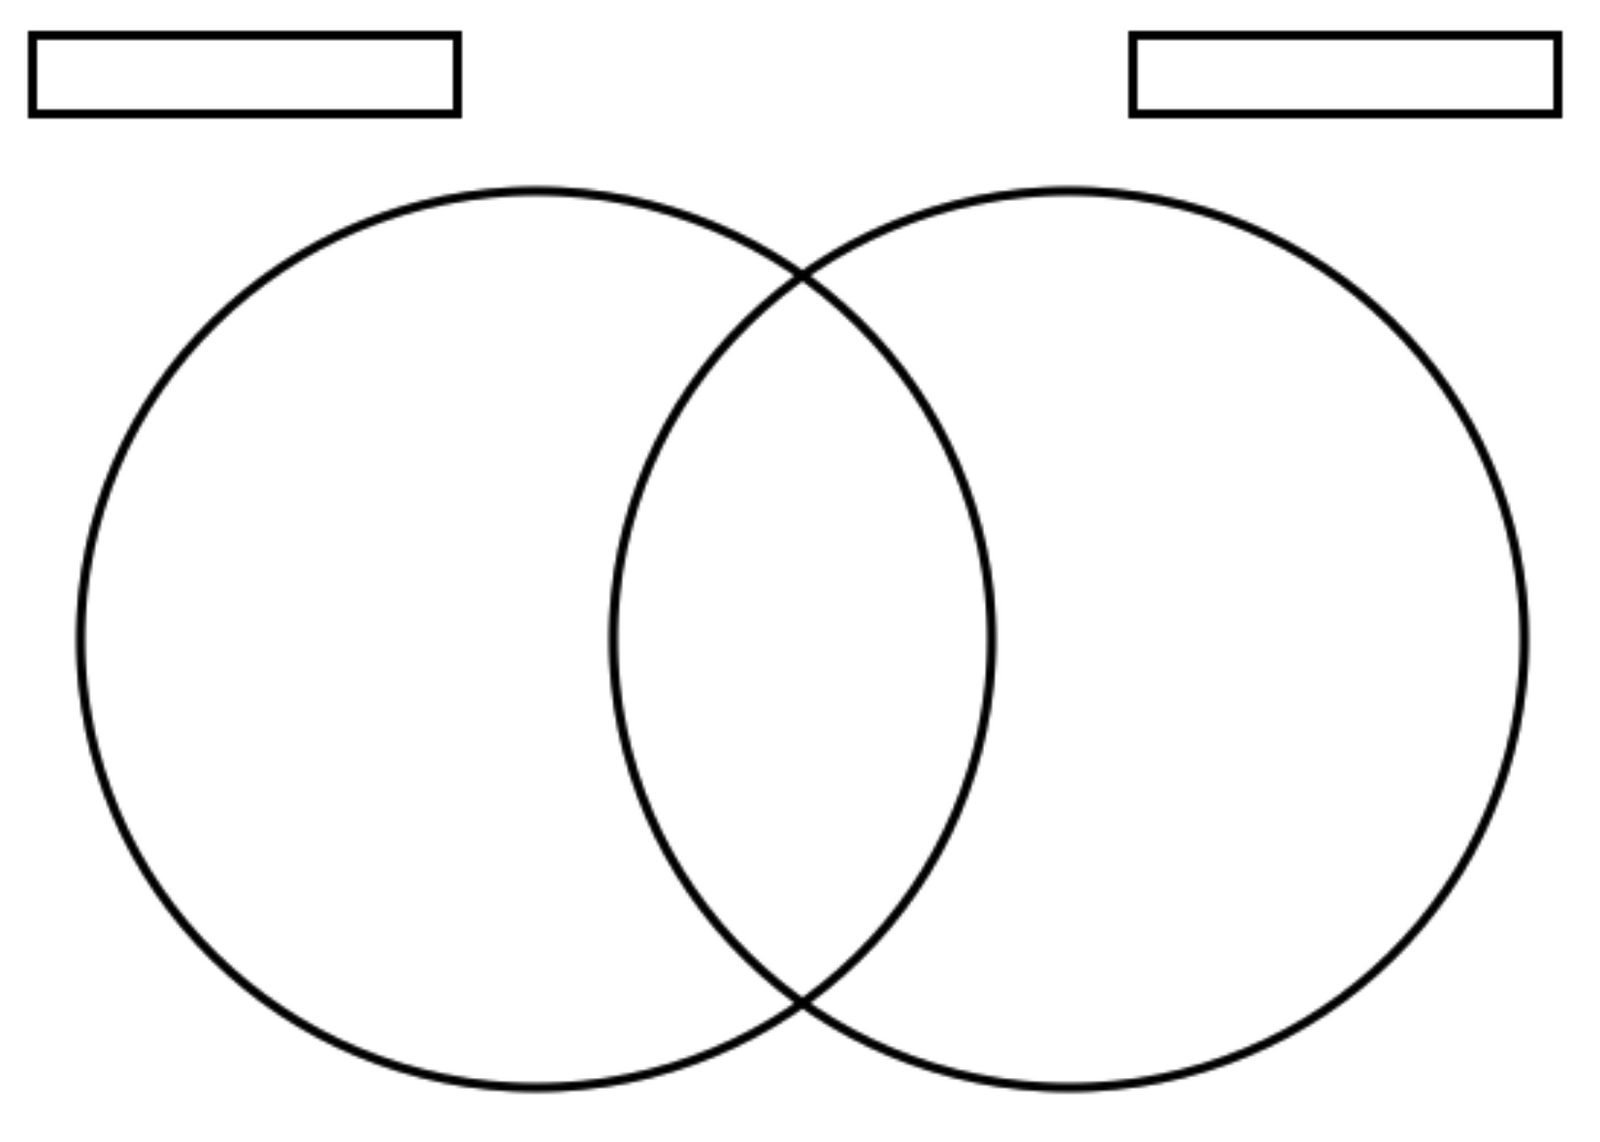 venn diagram template | School Stuff | Venn diagram